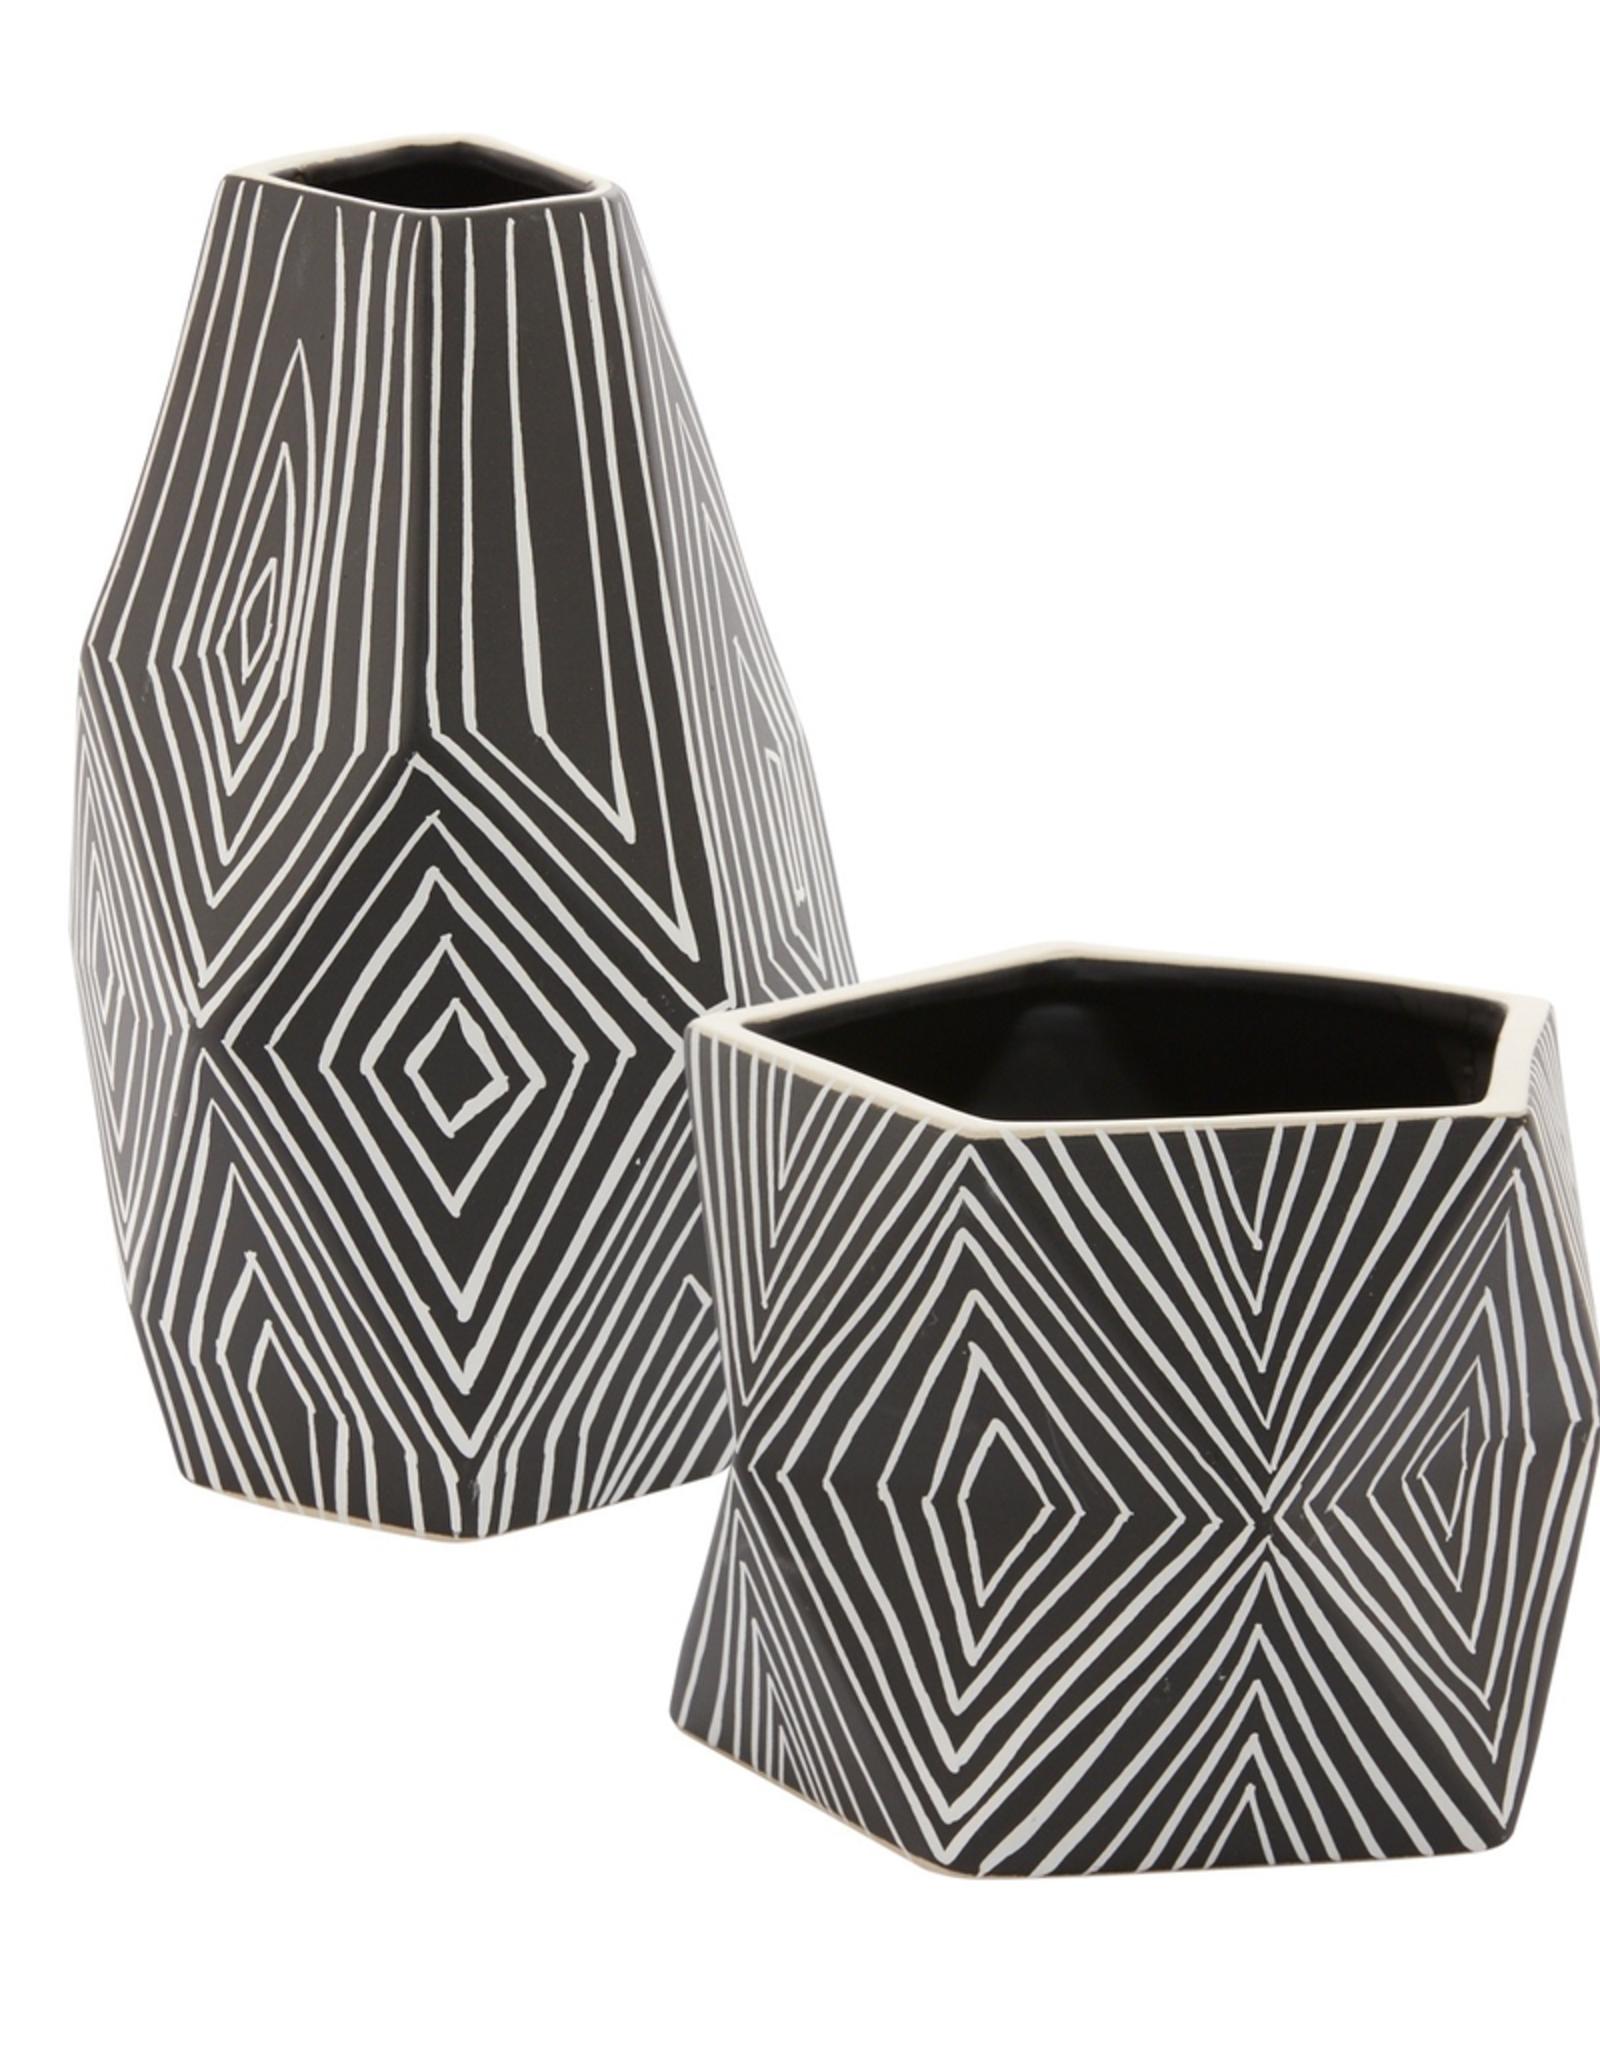 Astro Black & White Patterned Pot